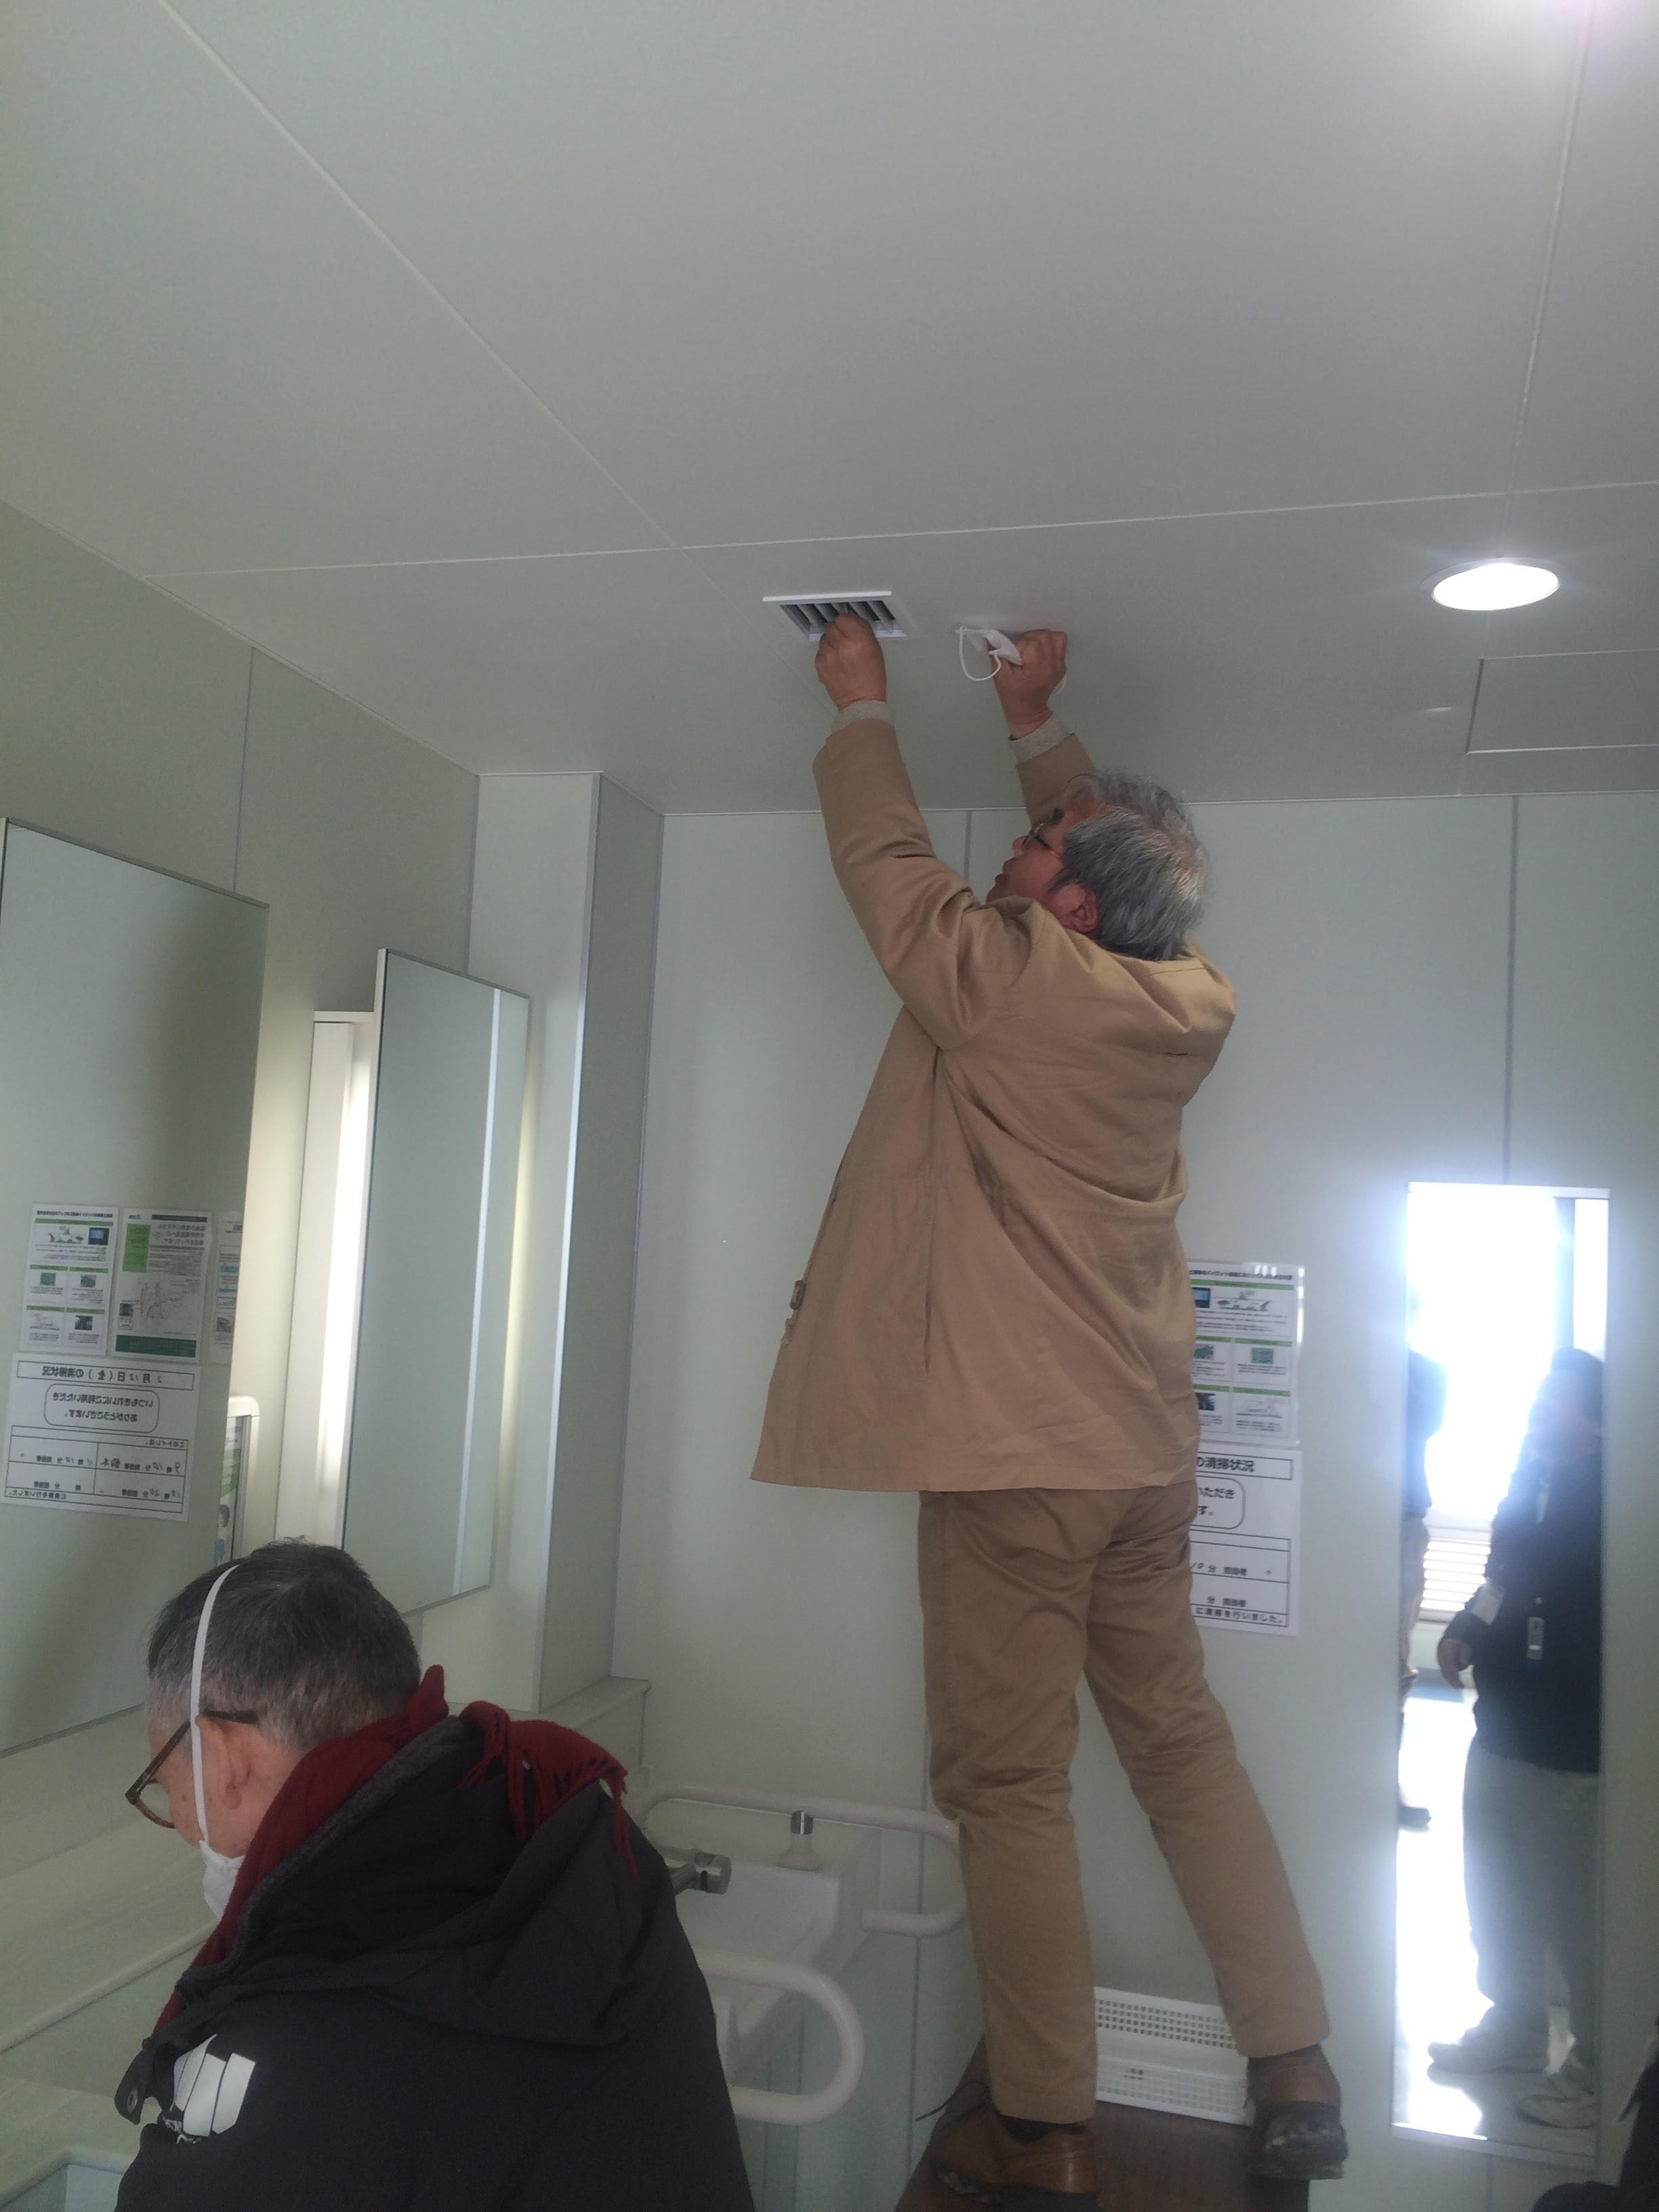 Measuring radiation in bathroom vents.